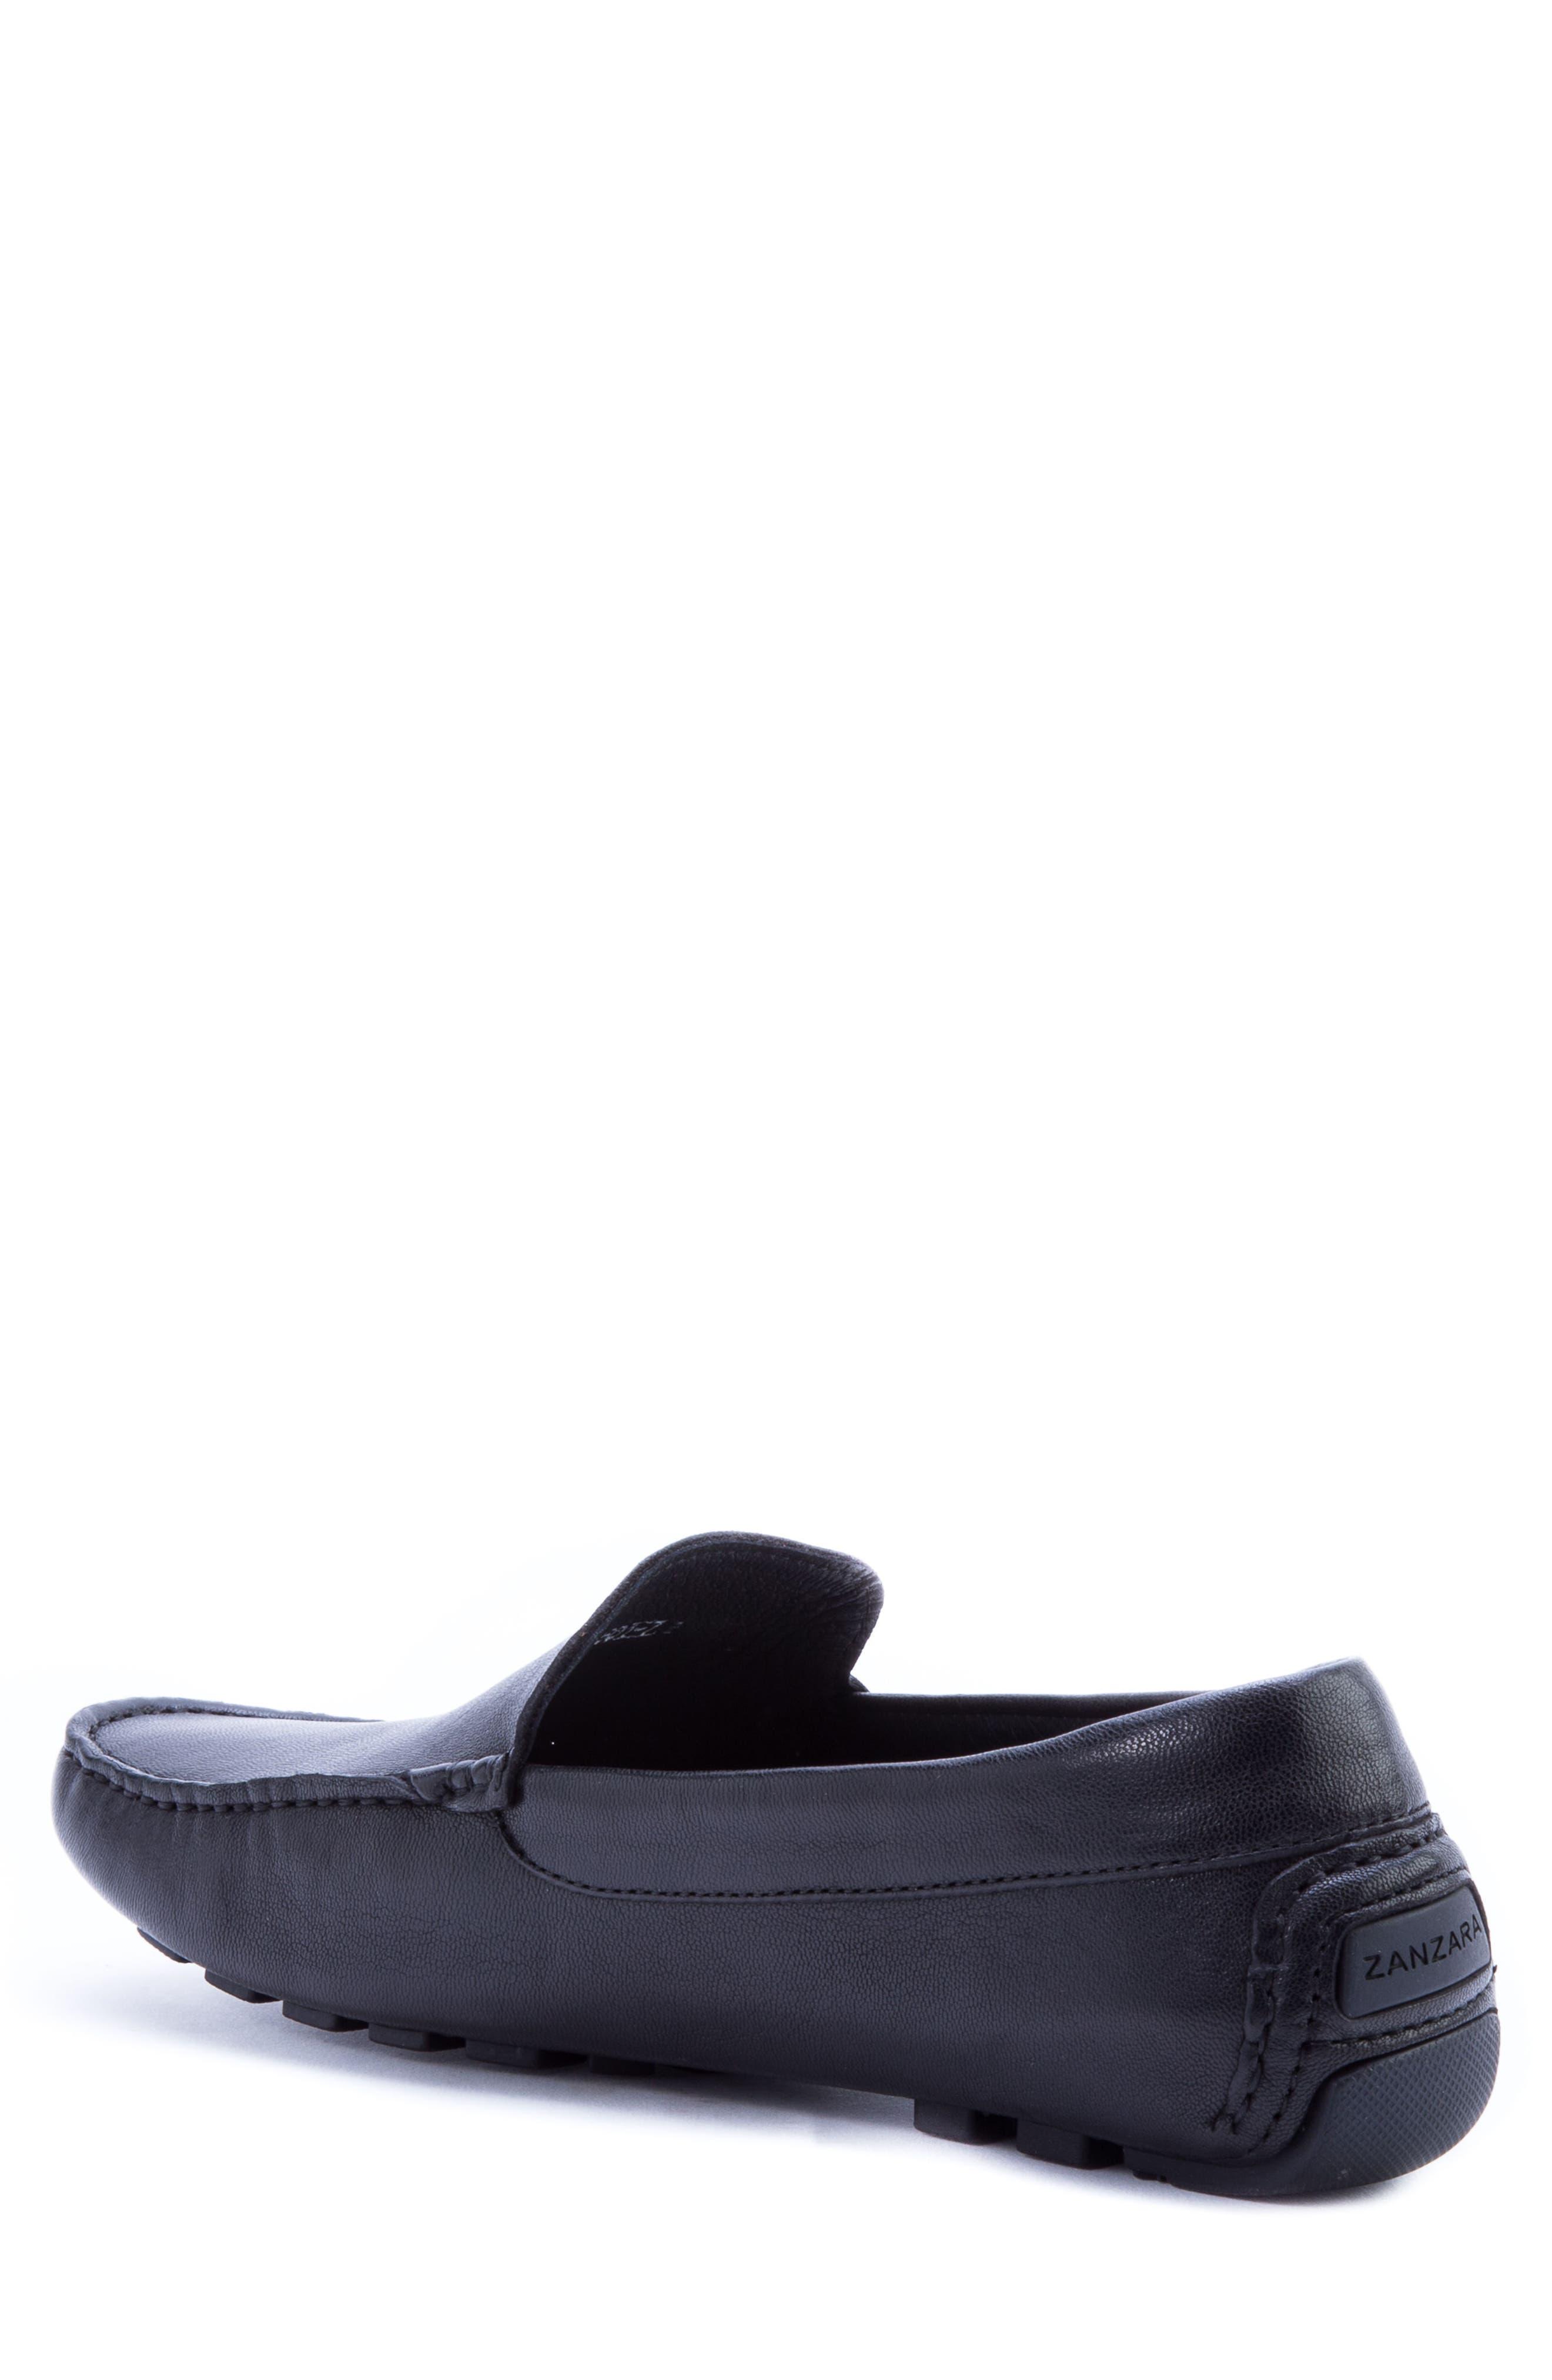 ZANZARA,                             Picasso 3 Moc Toe Driving Loafer,                             Alternate thumbnail 2, color,                             BLACK LEATHER